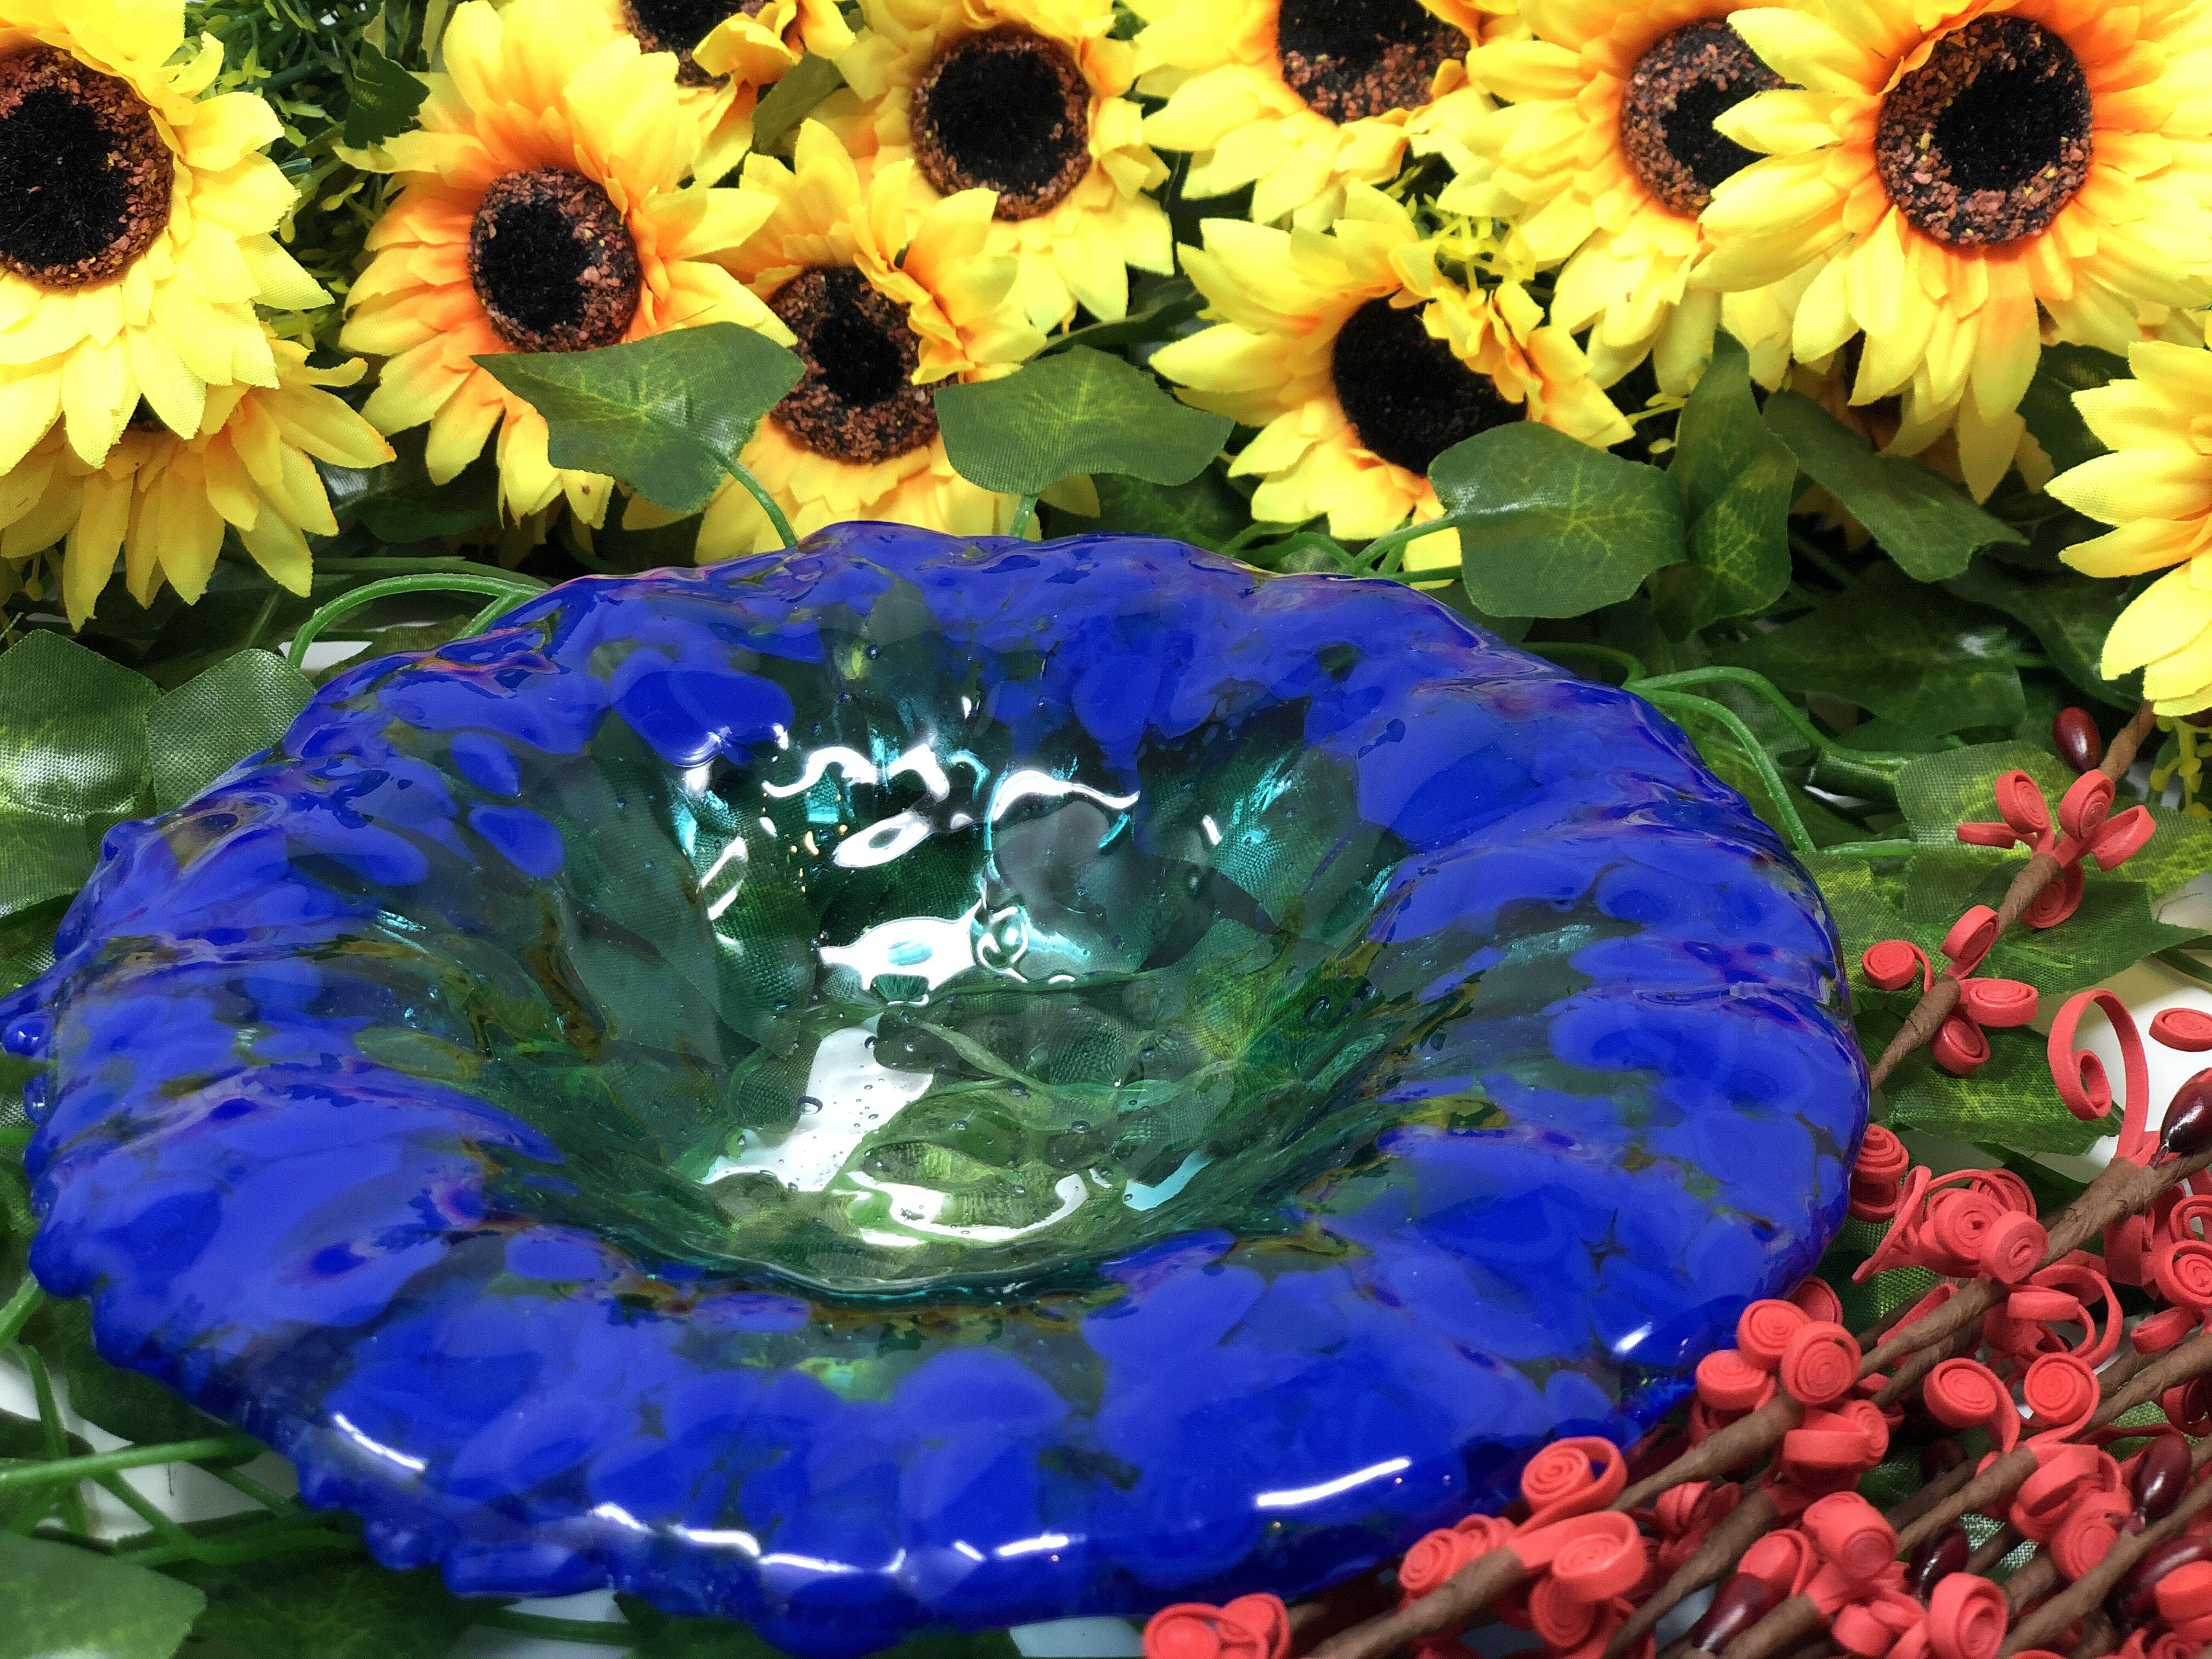 Birthday Glass Decorative Plates Bowls You Ll Love In 2021 Wayfair